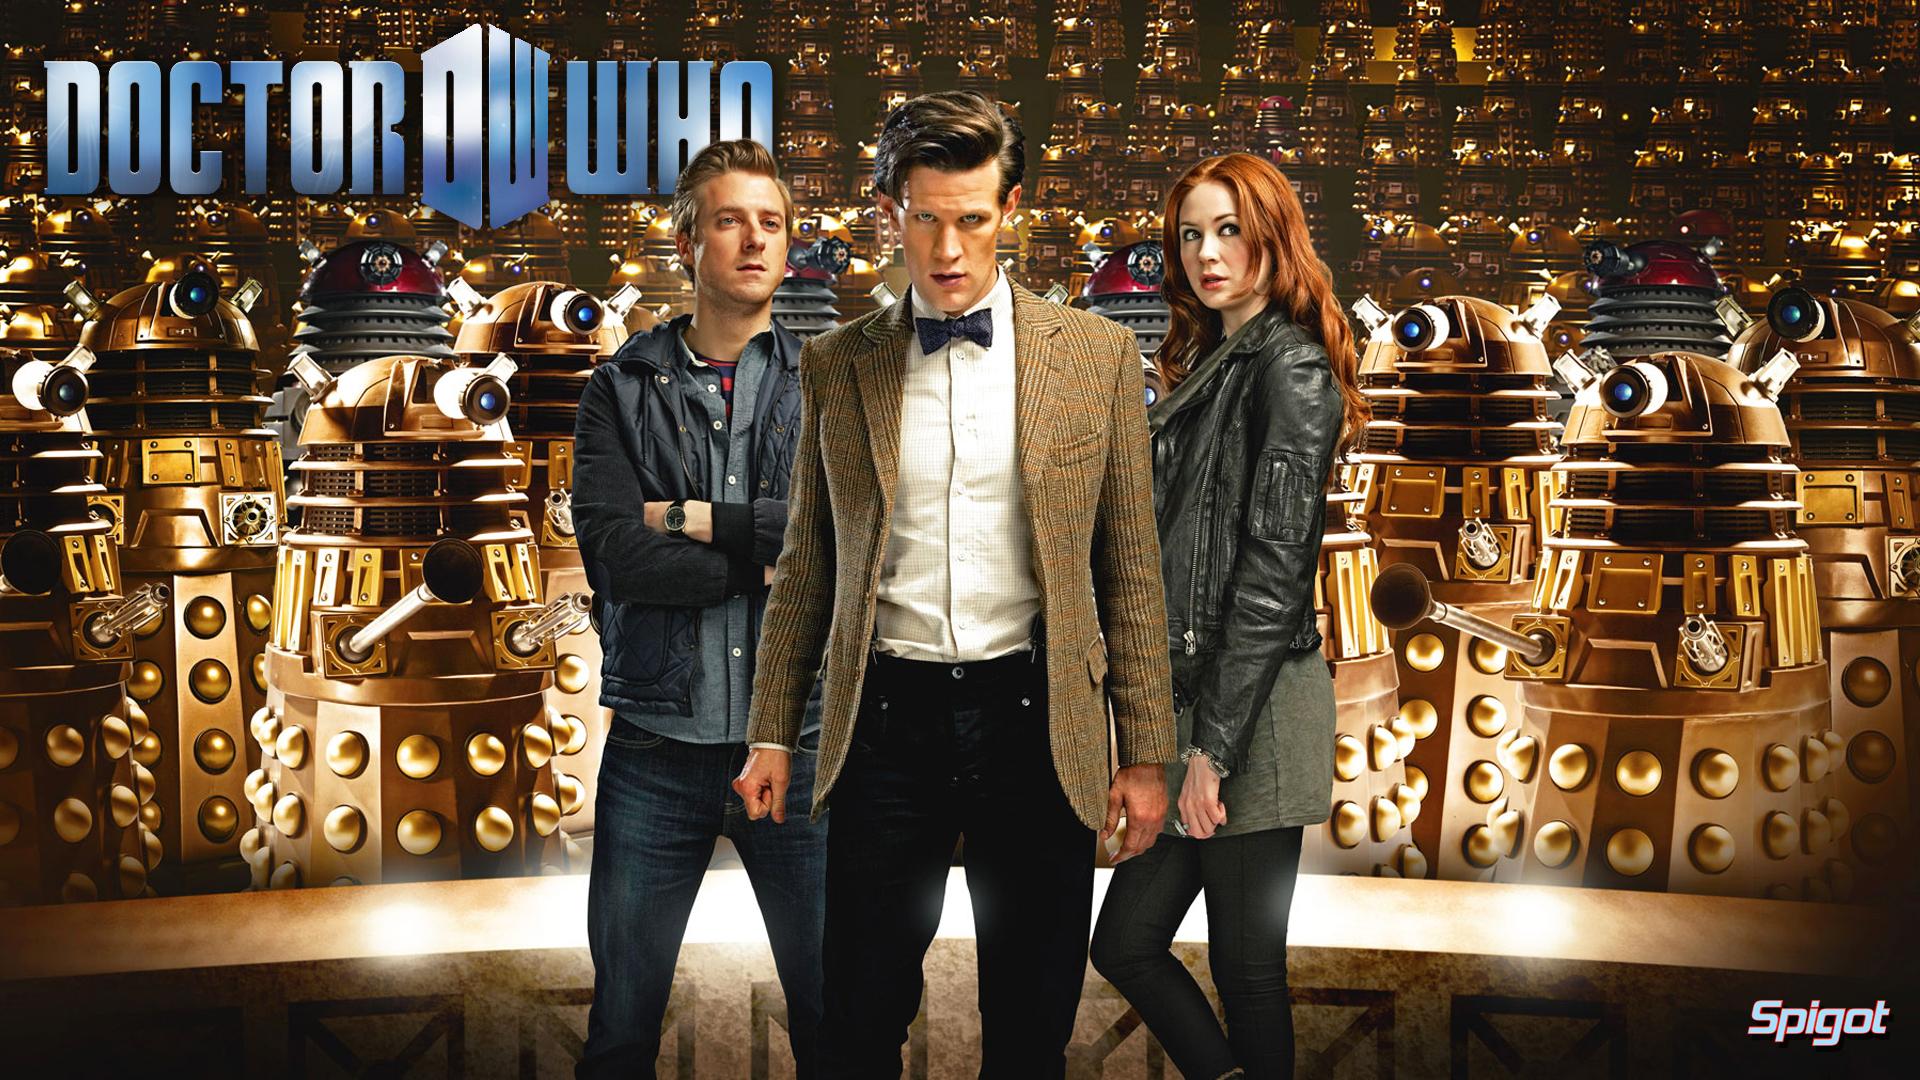 Doctor Who Season 7 Wallpapers George Spigot S Blog